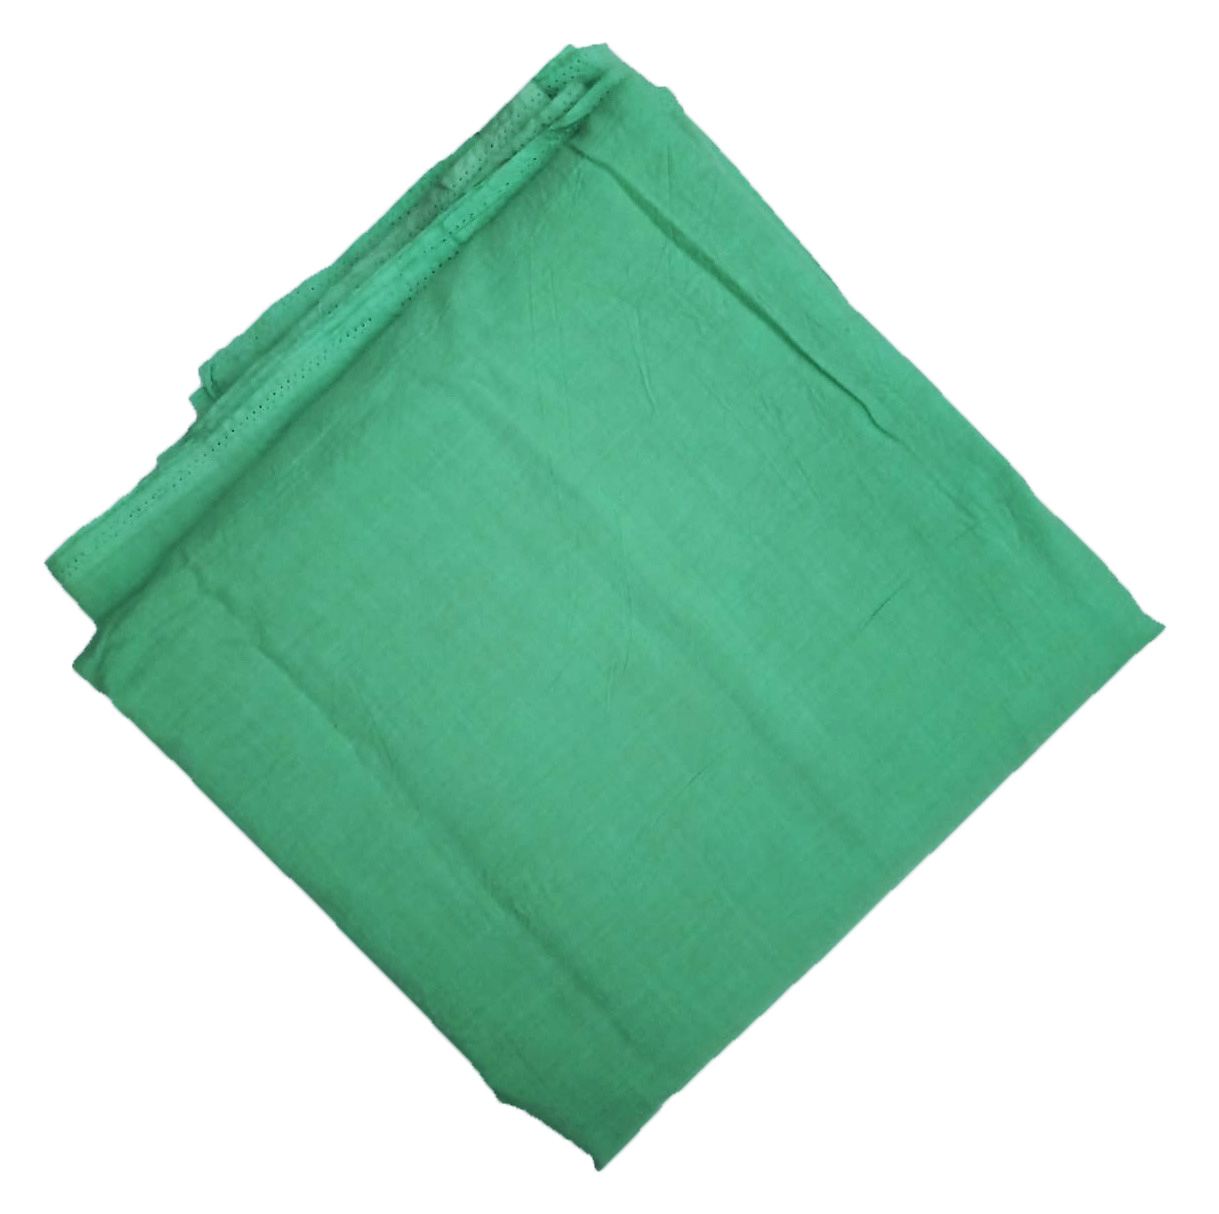 Sea Green Crush Cotton Dress Material for Salwar Suit CJ043 1